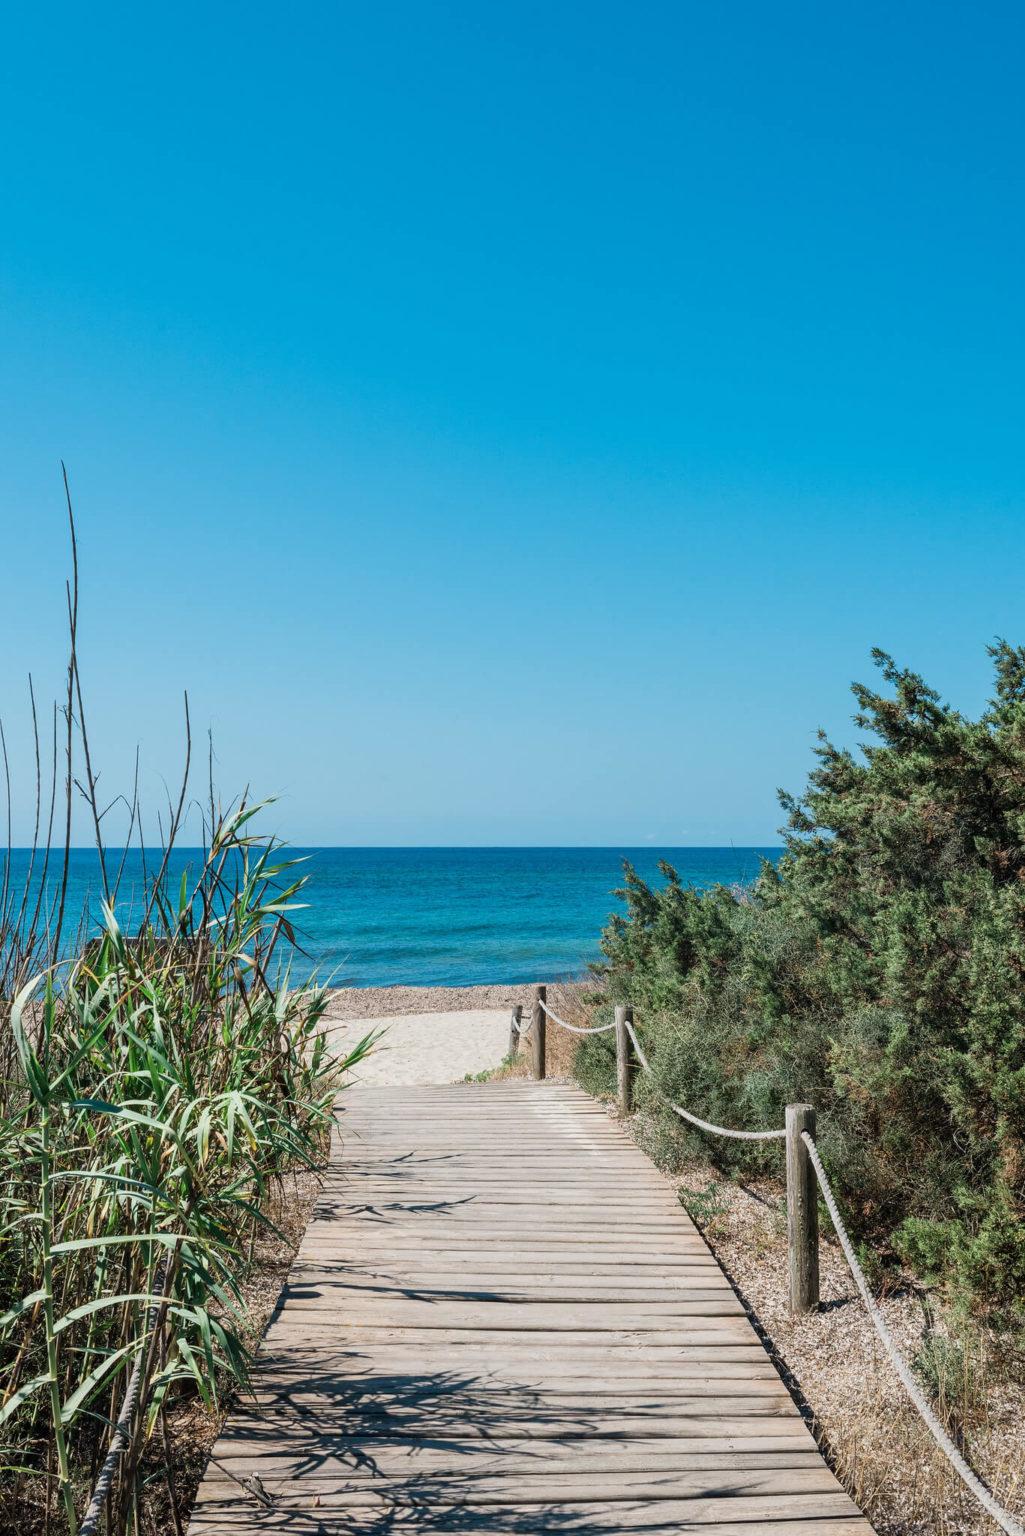 https://www.white-ibiza.com/wp-content/uploads/2020/03/formentera-beaches-migjorn-2020-01-1025x1536.jpg